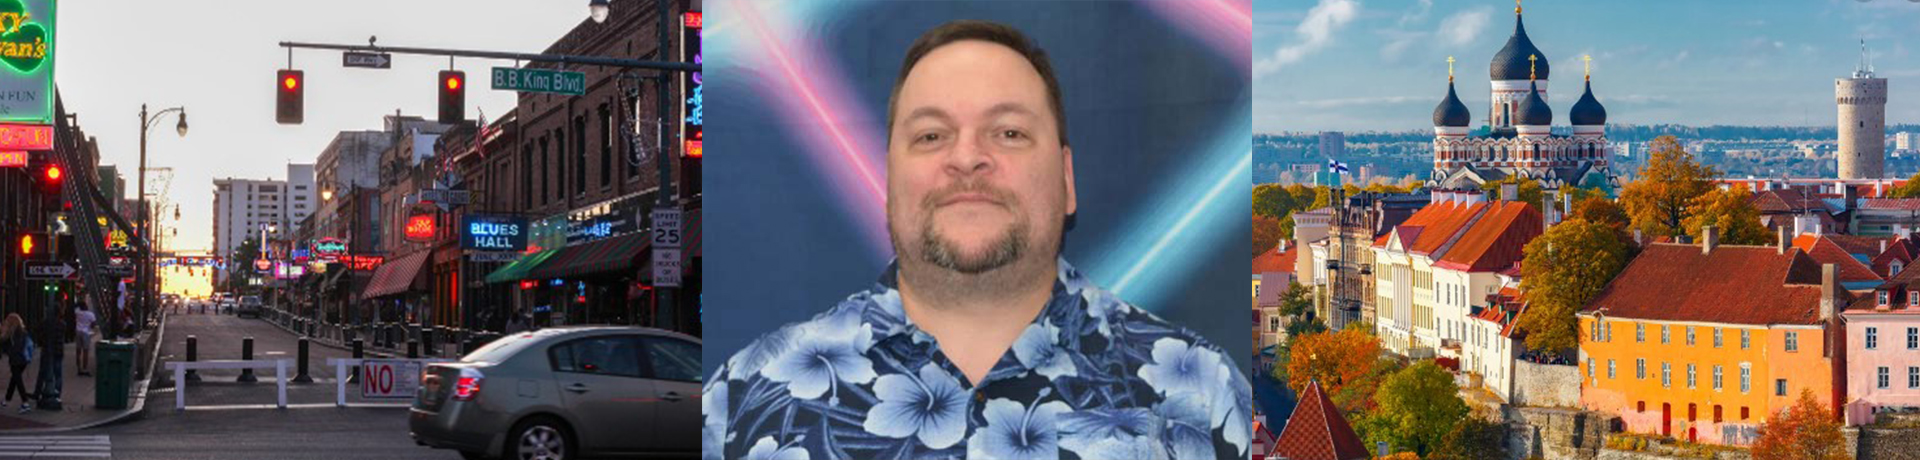 Employee Spotlight – Matt St. Thomas